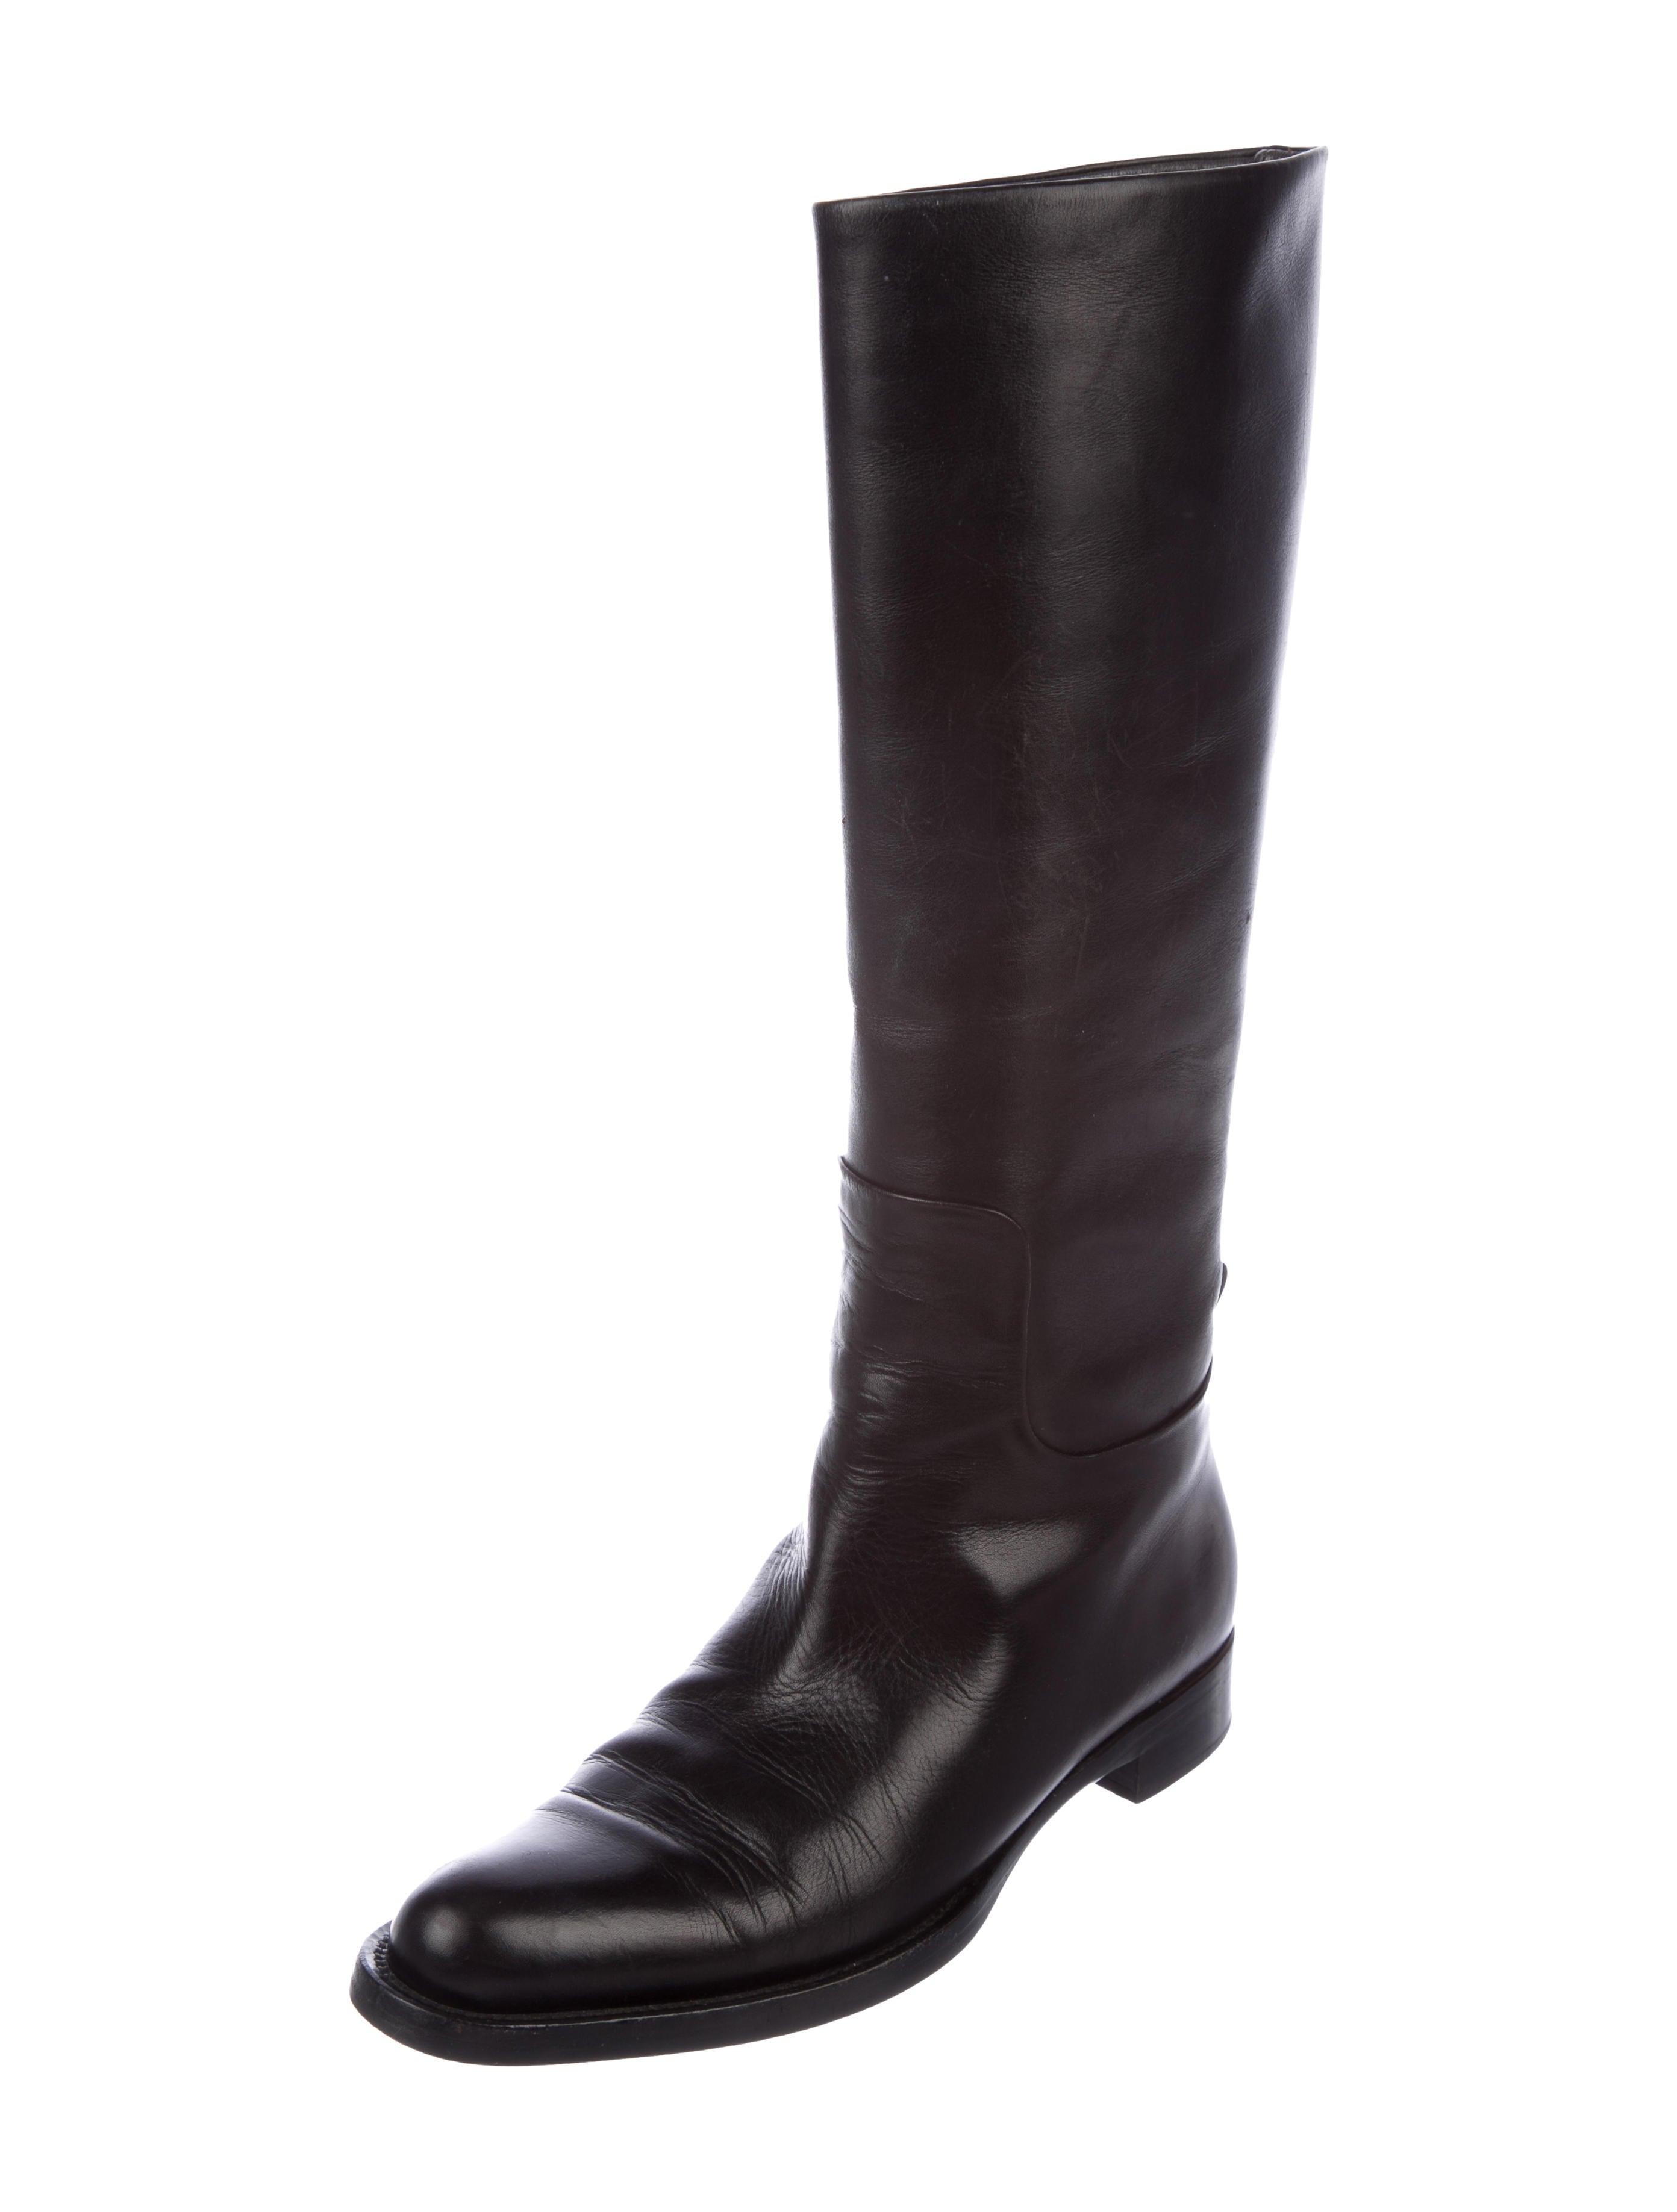 classic Jil Sander Leather Knee-High Boots w/ Tags official site online sale footlocker finishline rqzC4UVpcJ